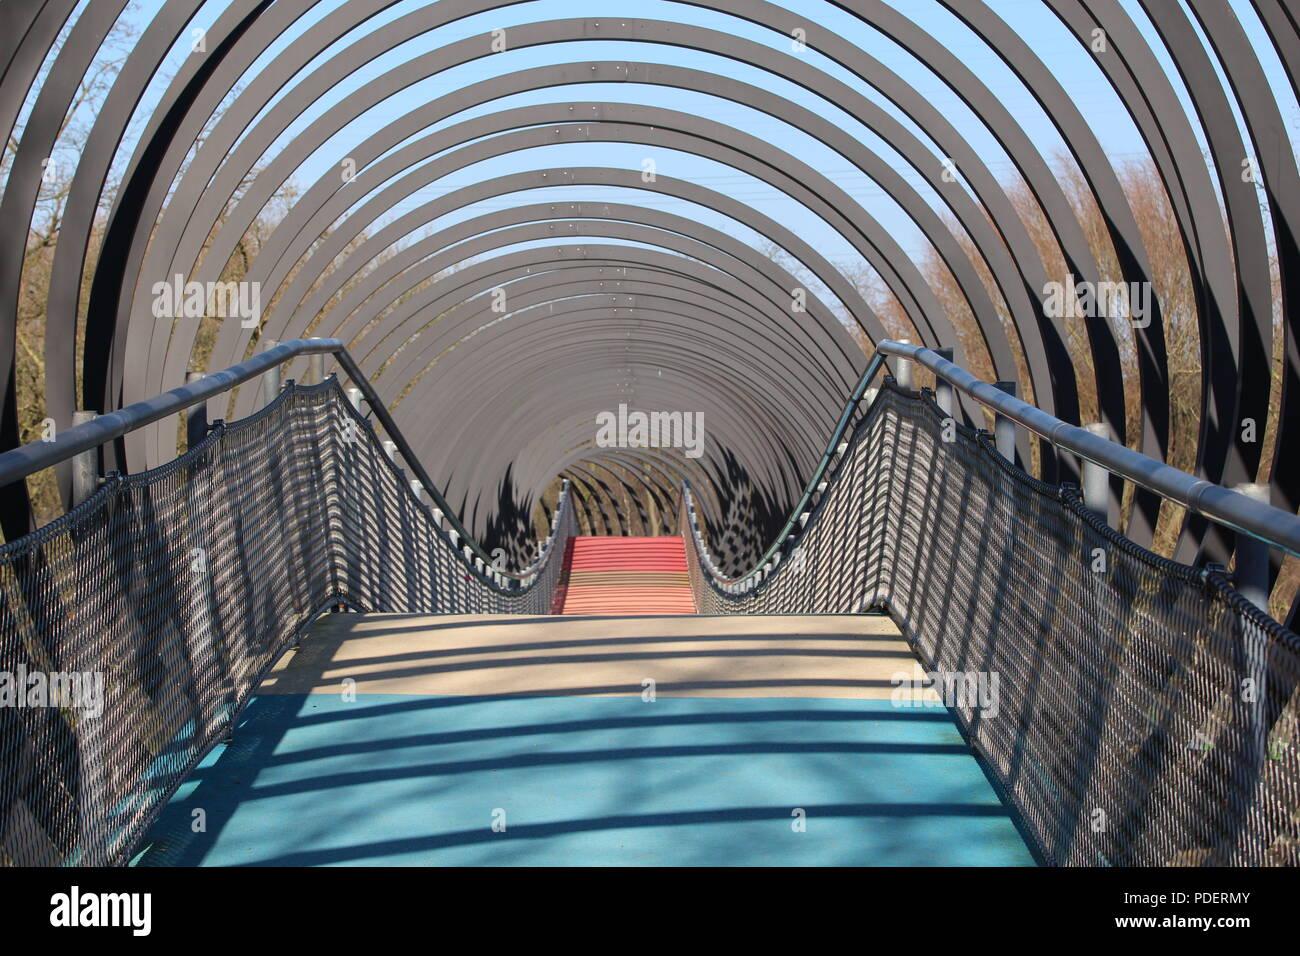 Slinky Springs to Fame Bridge in Oberhausen Ruhr Area Stock Photo